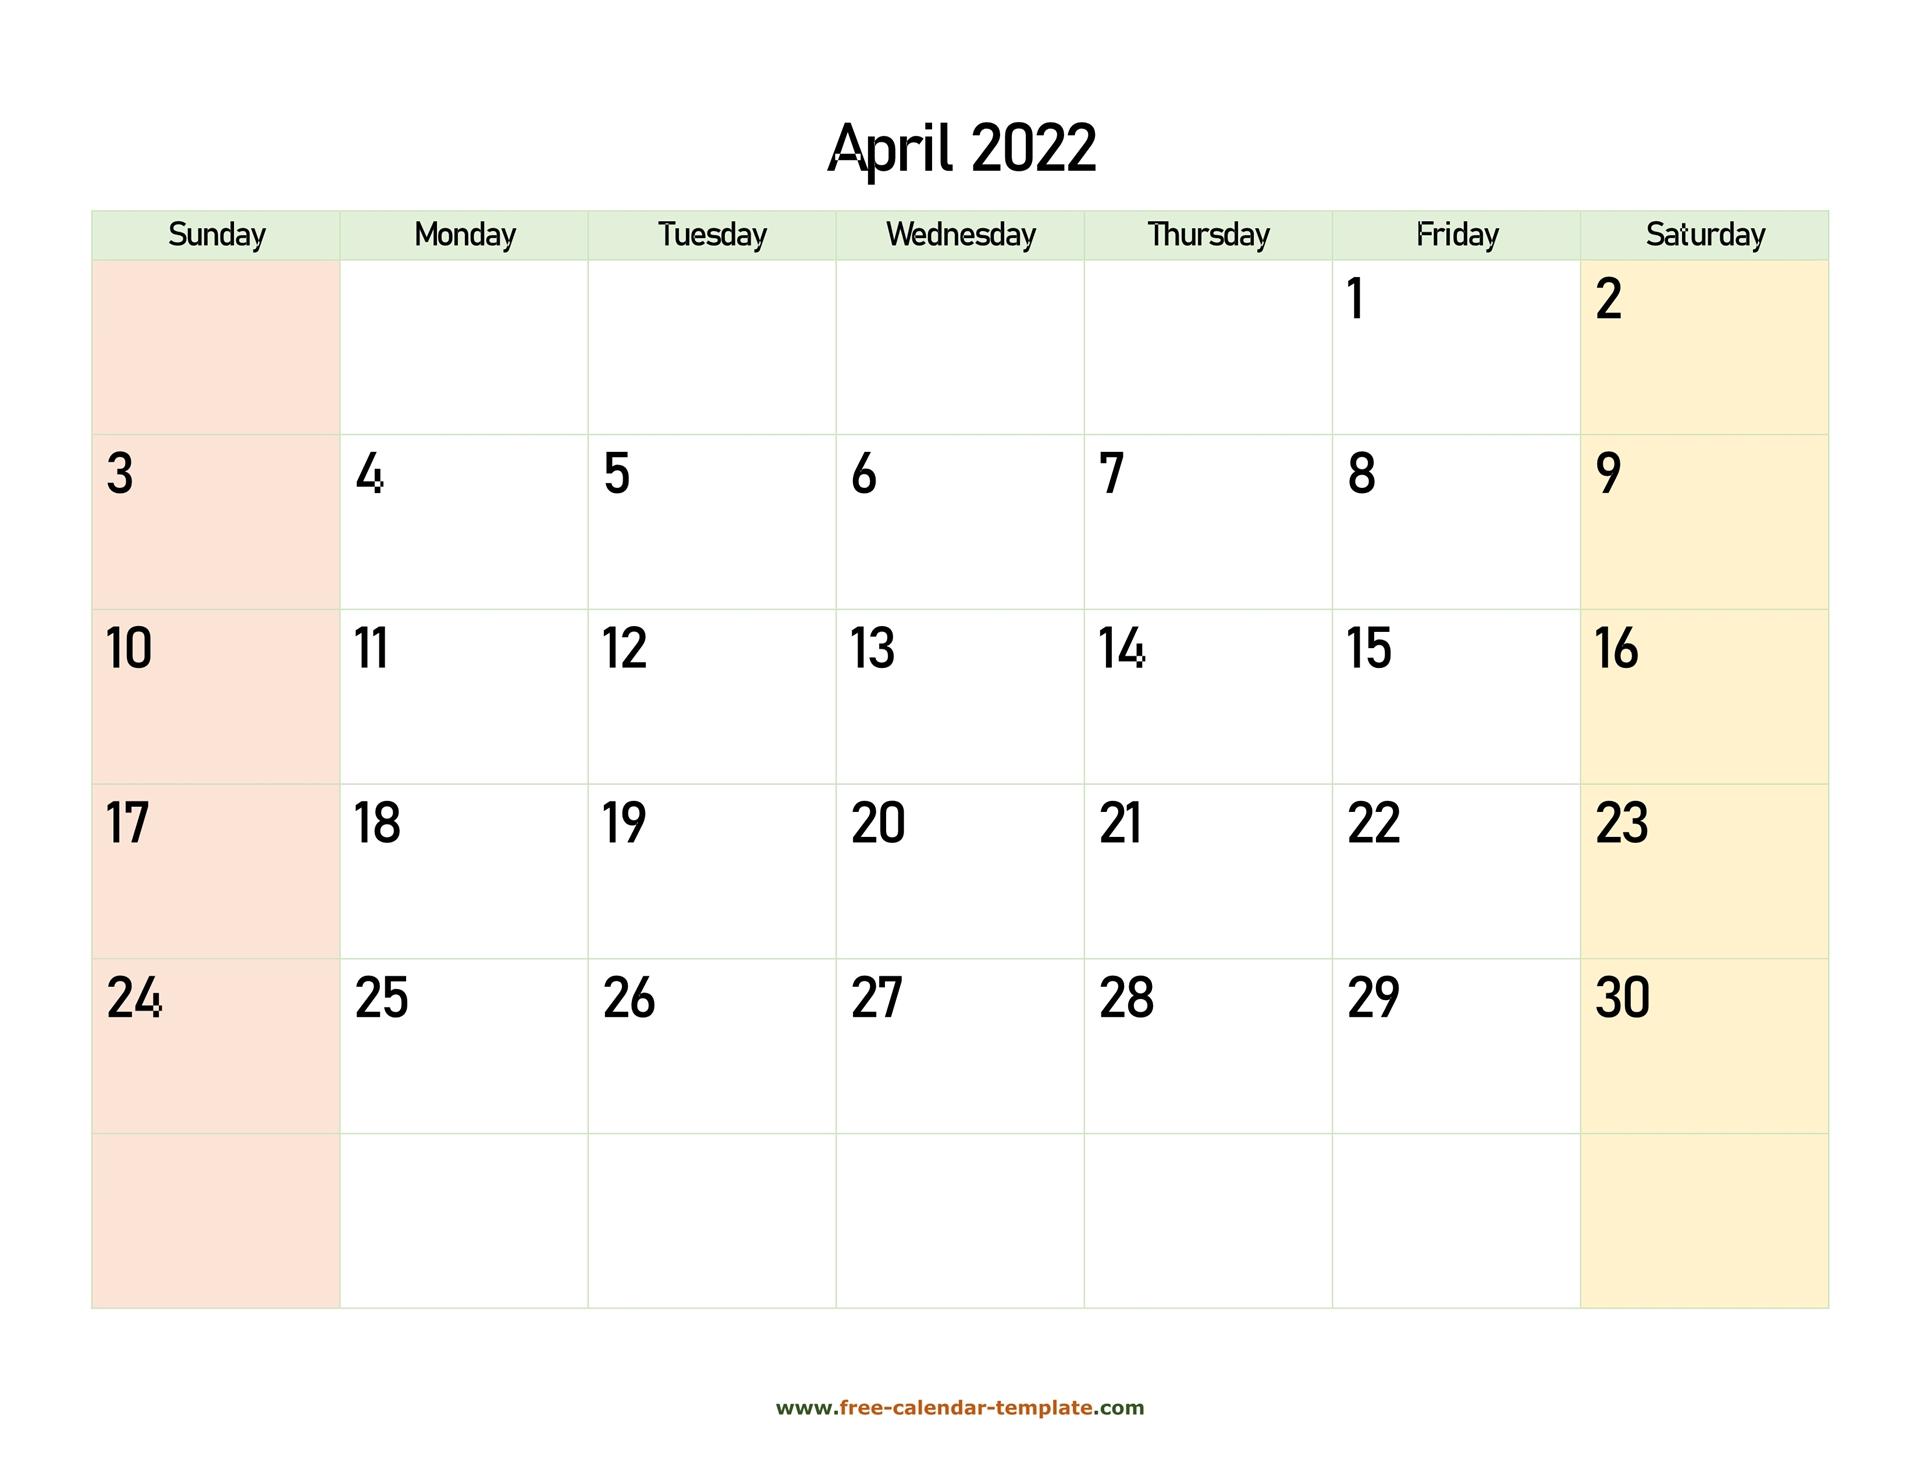 April 2022 Free Calendar Tempplate   Free Calendar Intended For March & April 2022 Calendar Free Printable